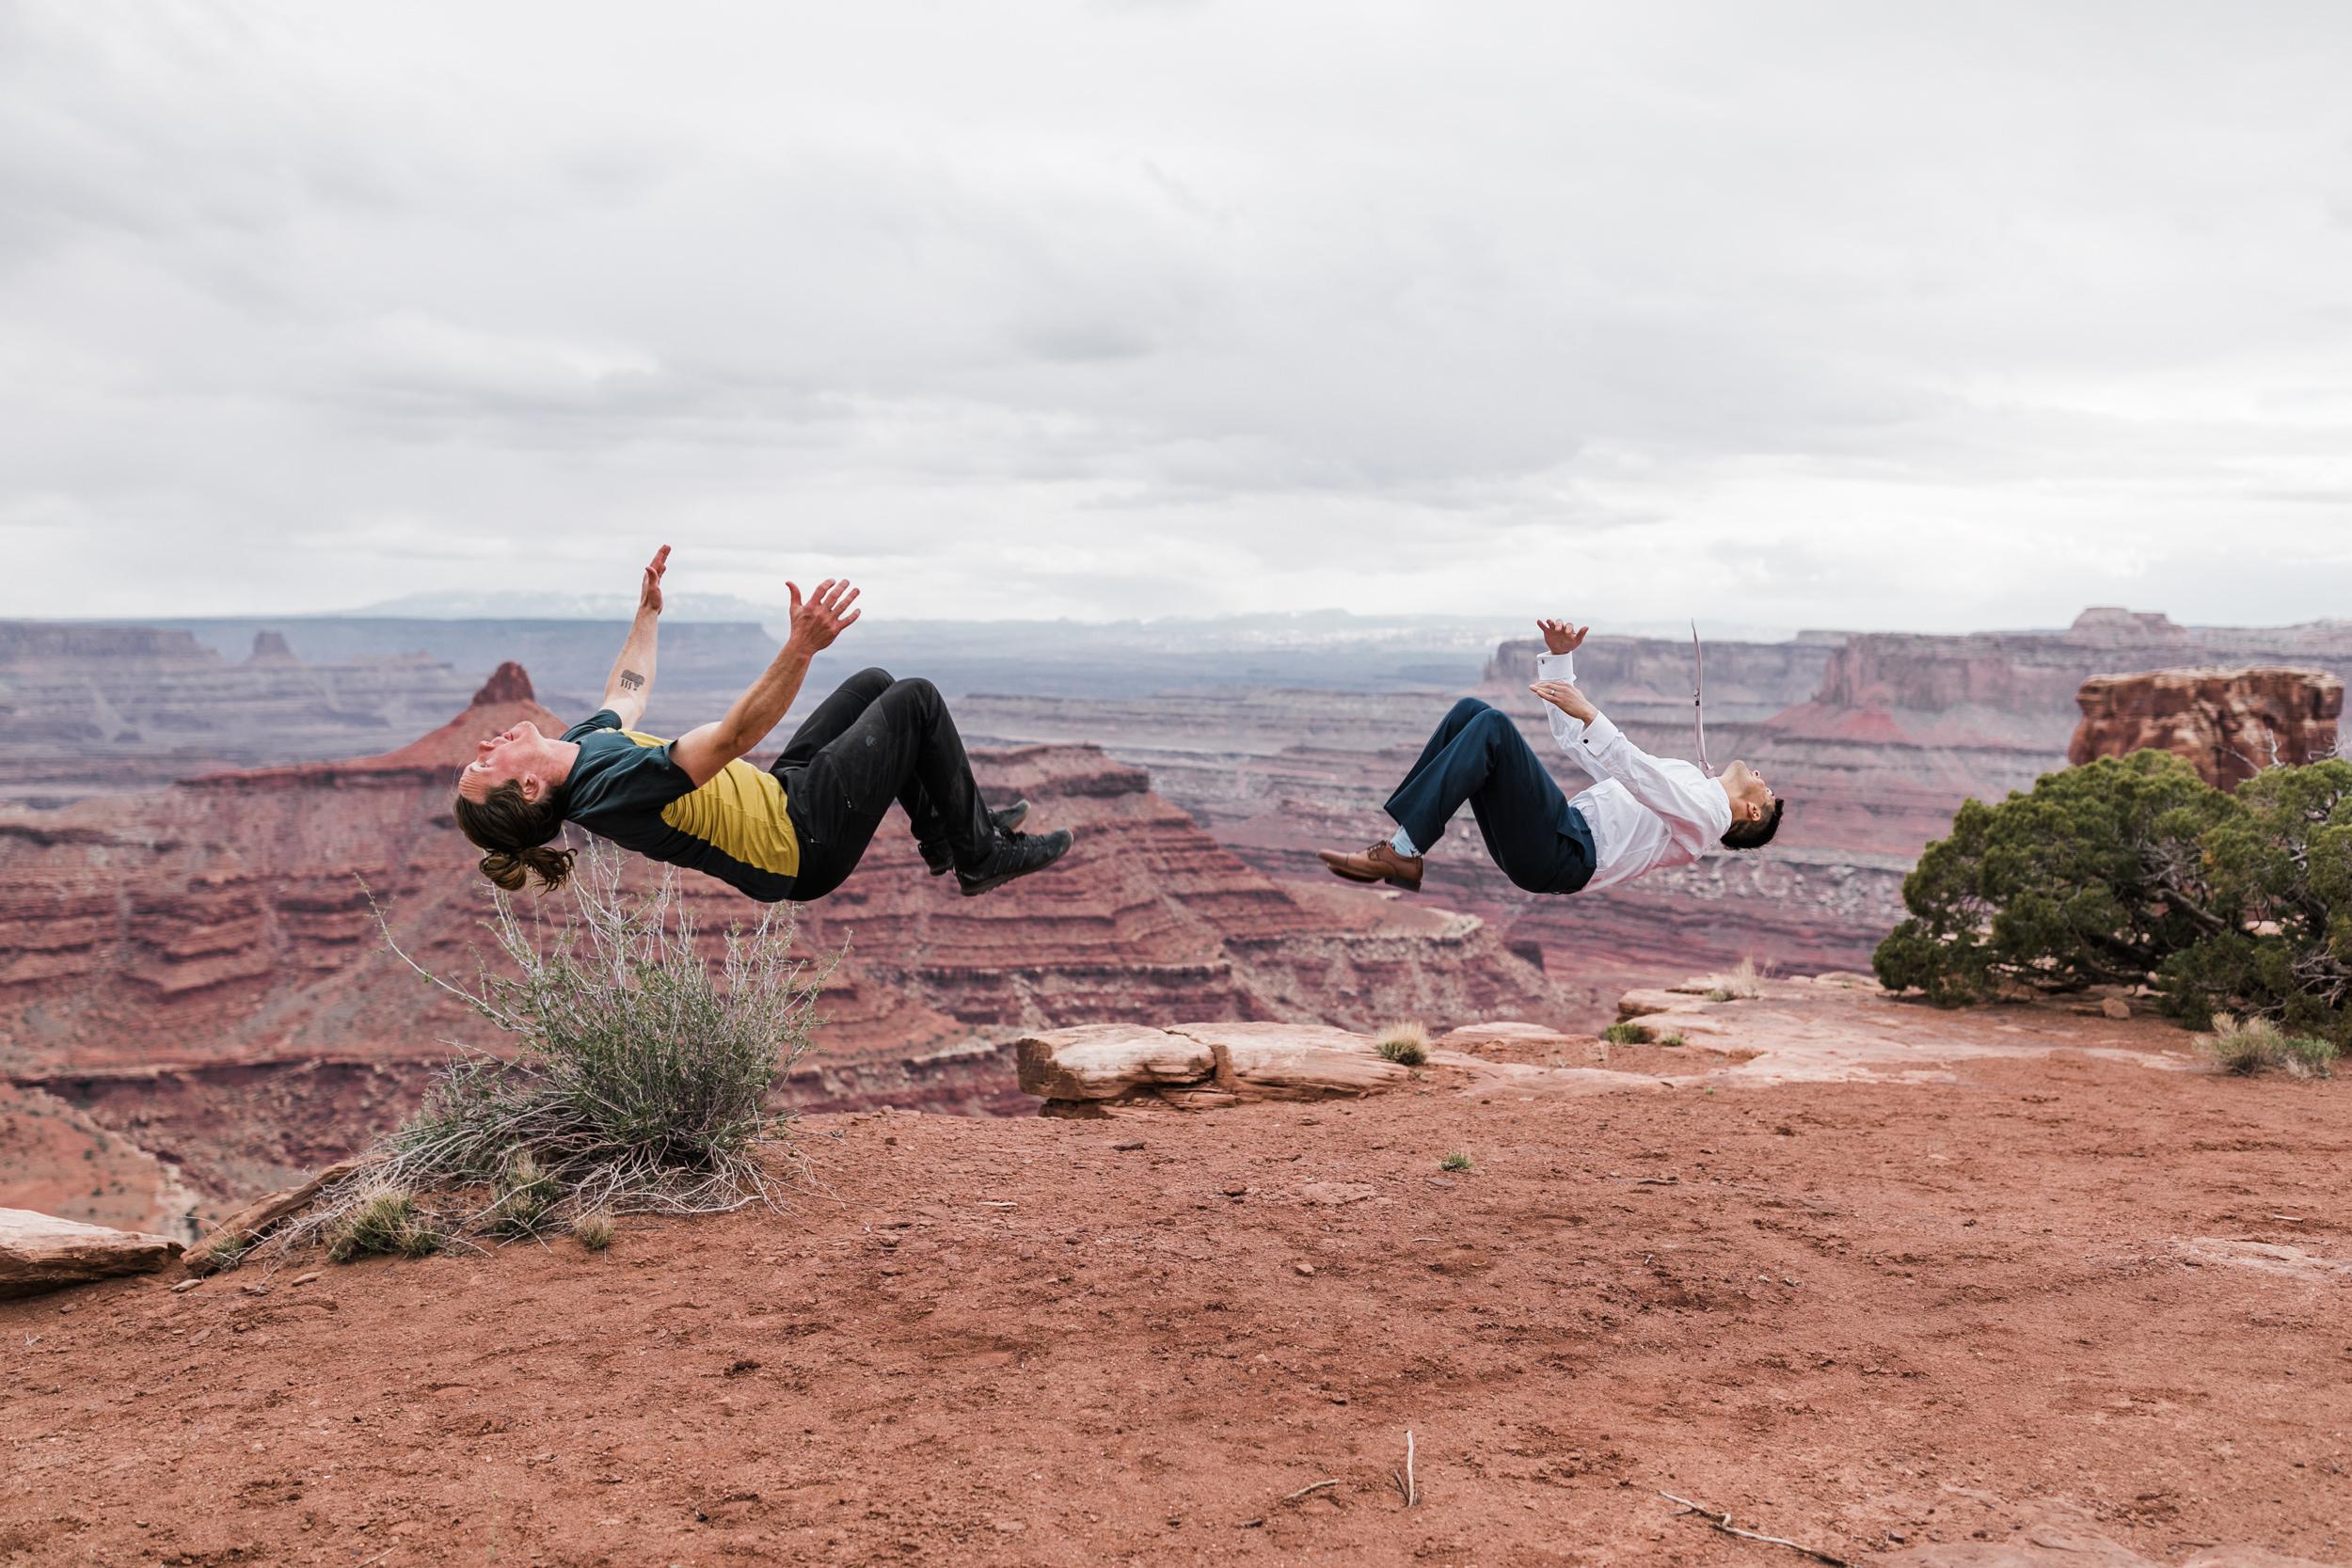 Jeep-Wedding-Moab-Utah-Hearnes-Adventure-Elopement-Photography-32.jpg